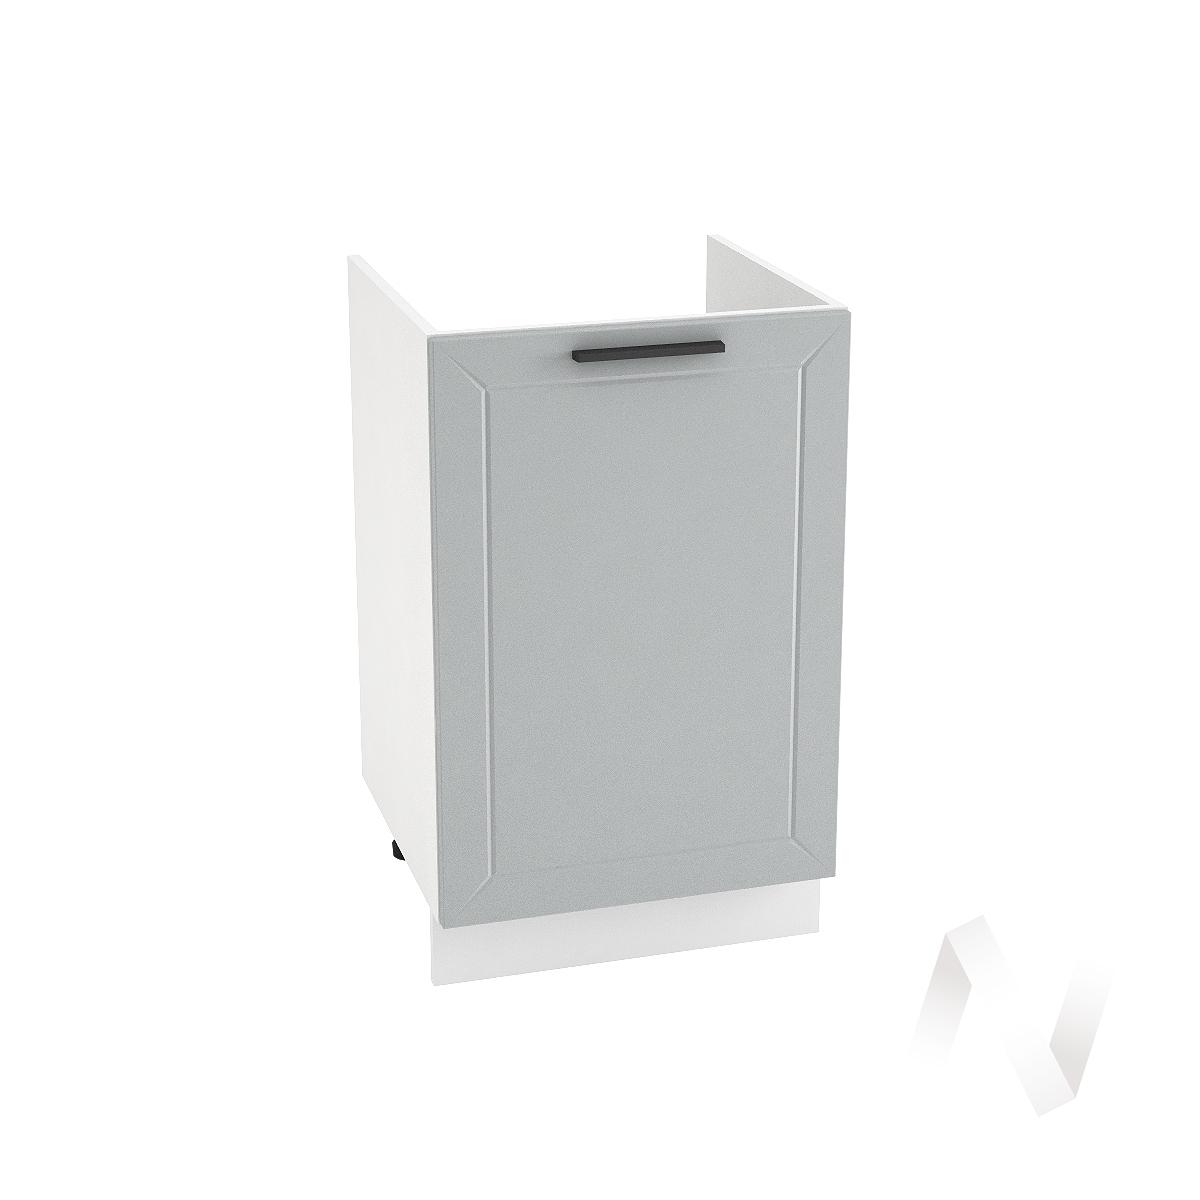 "Кухня ""Глетчер"": Шкаф нижний под мойку 500, ШНМ 500 (Гейнсборо Силк/корпус белый)"